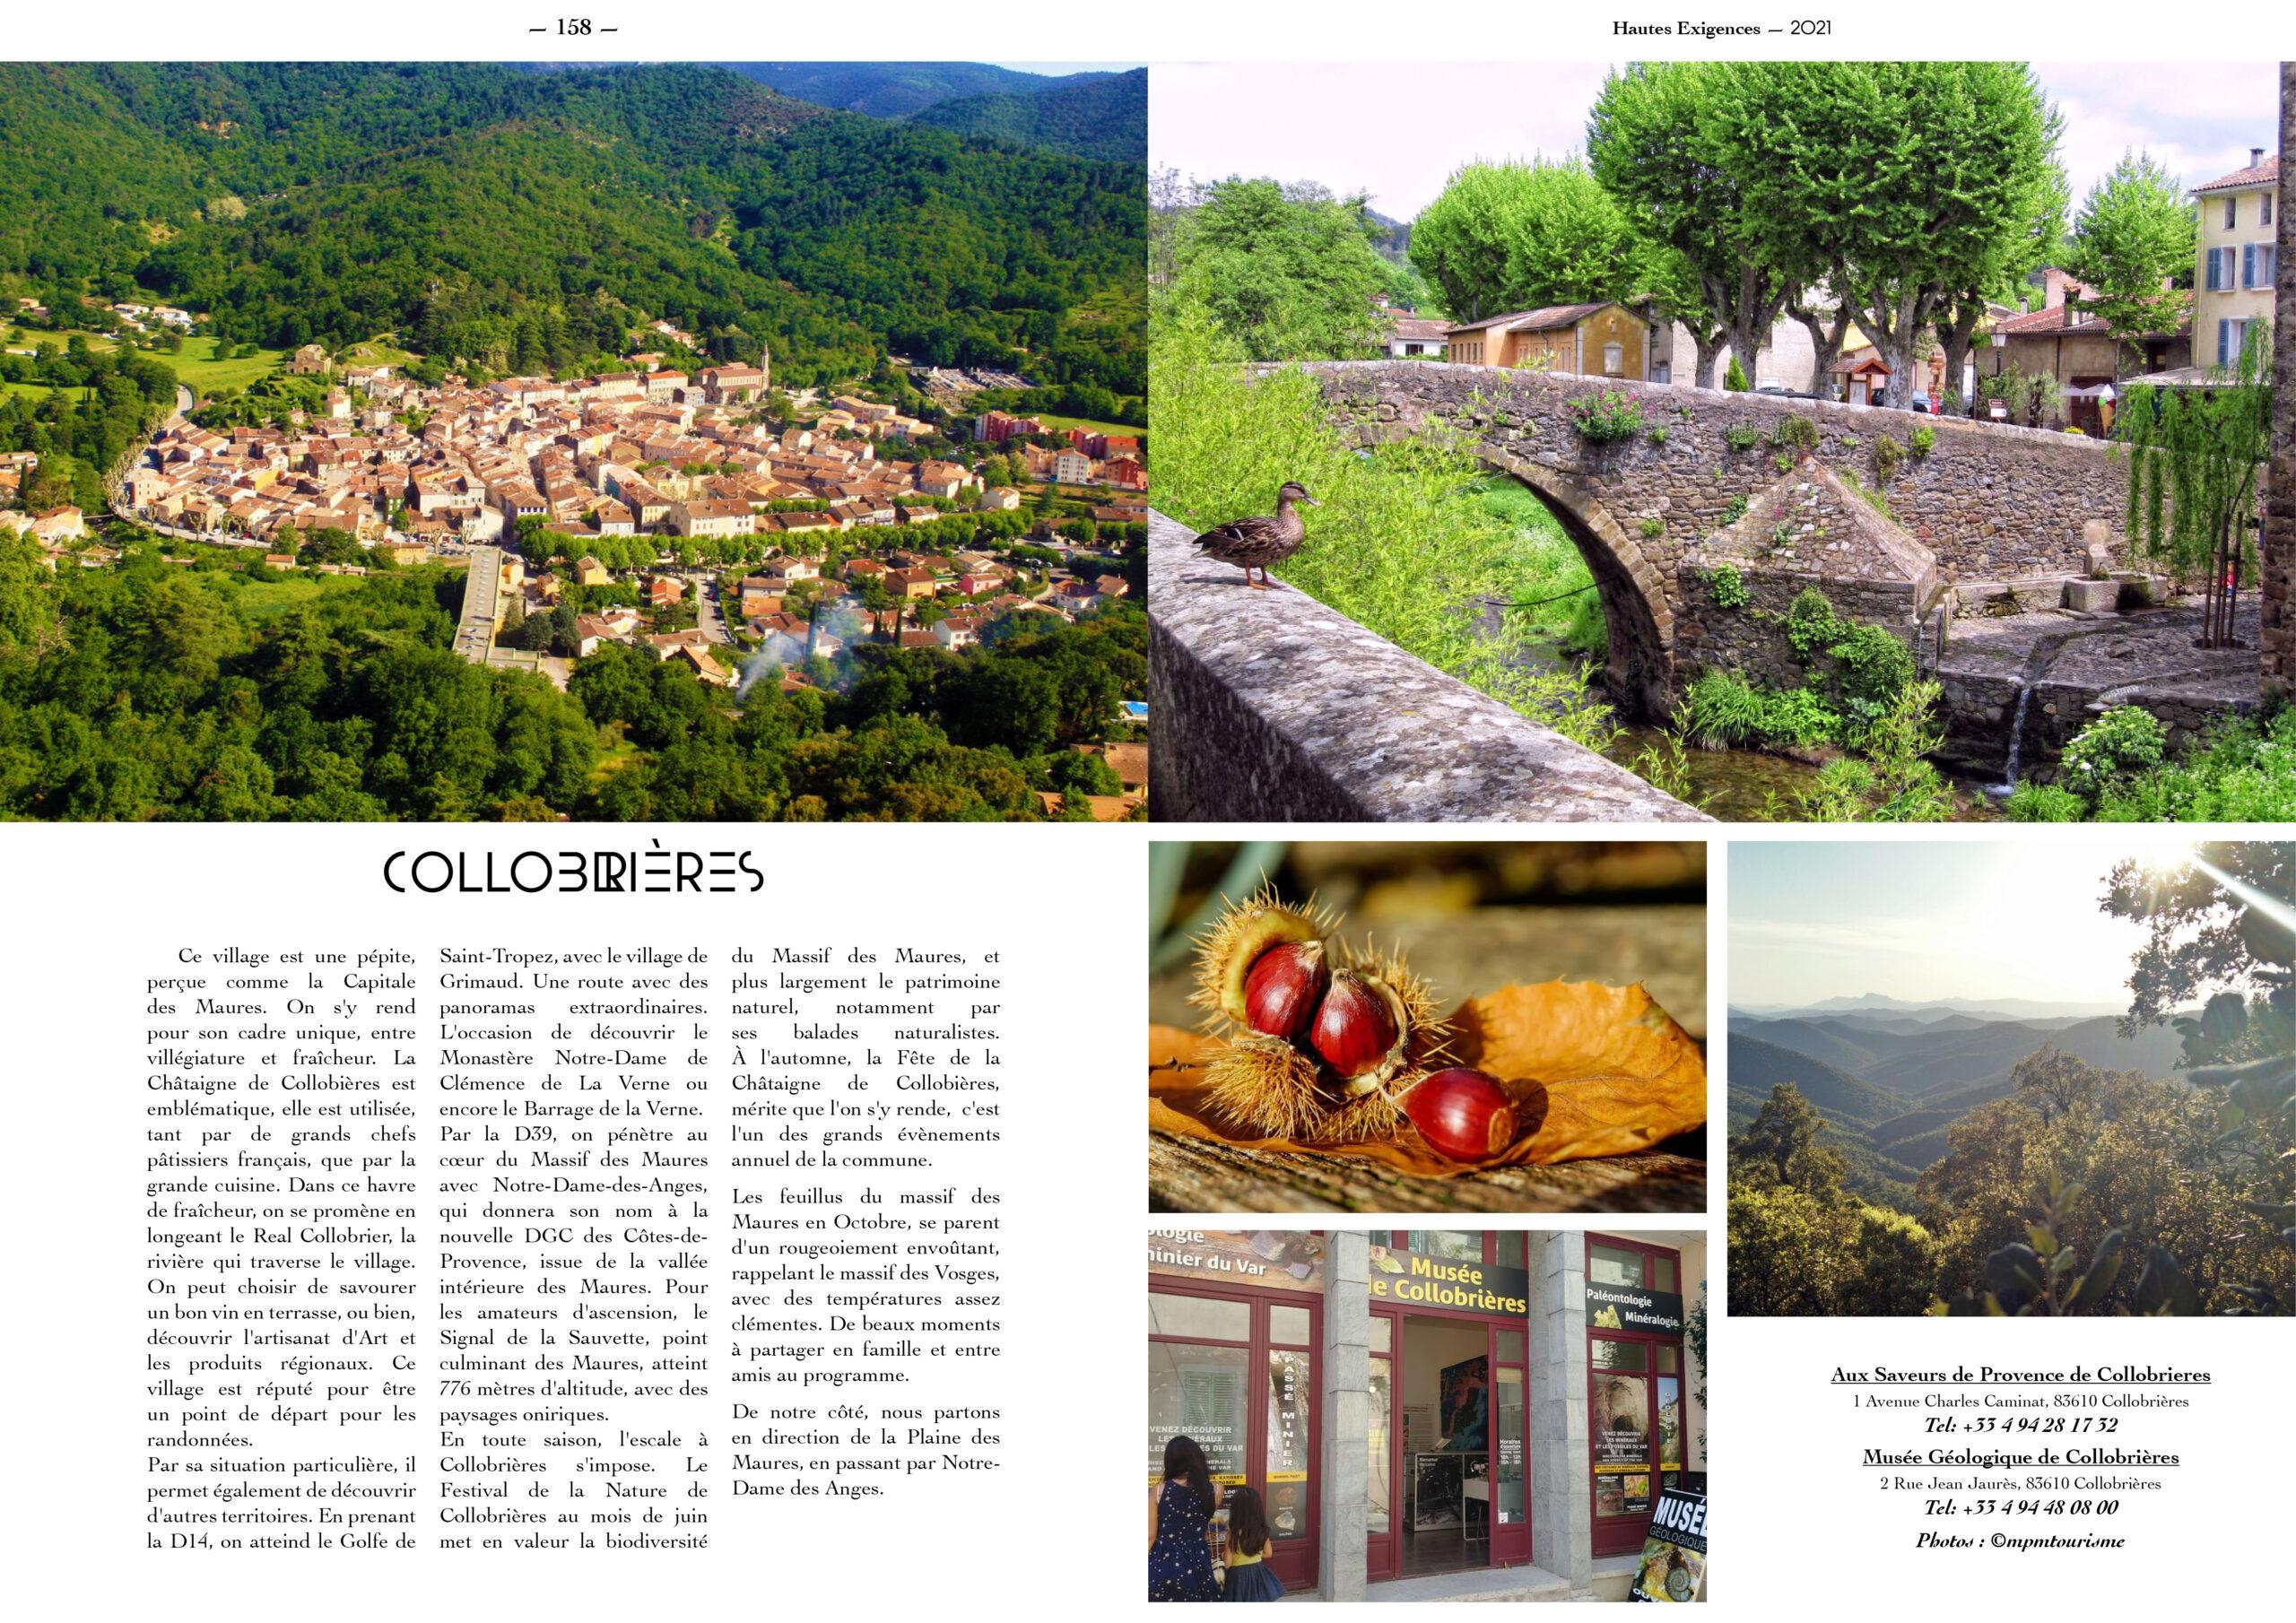 Hautes Exigences Magazine Hors Serie 2021 page 156-157